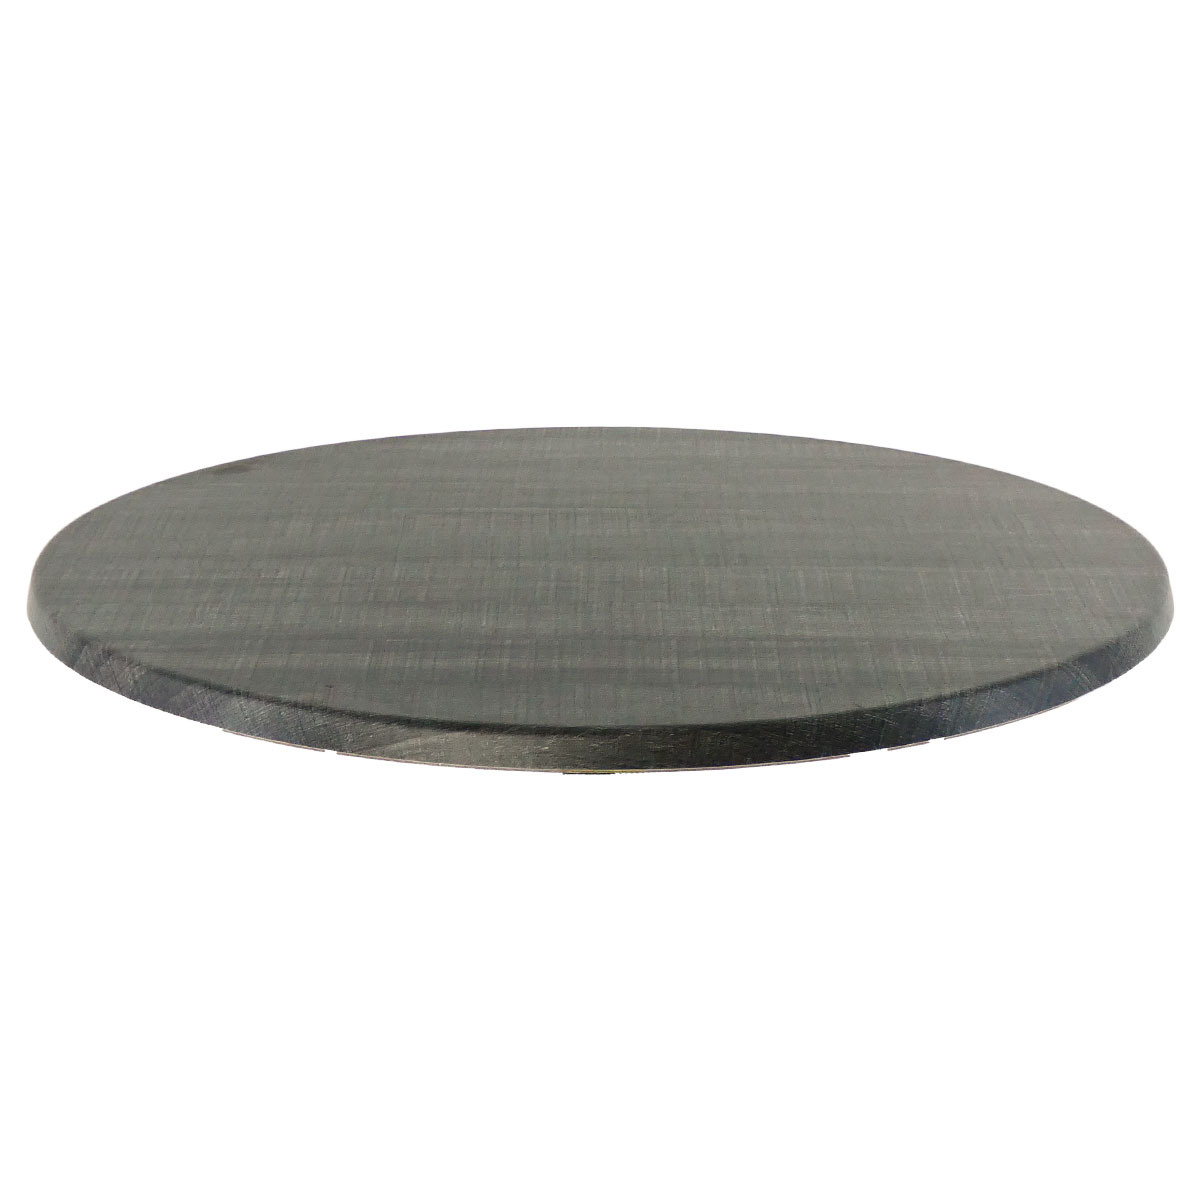 TICLA R70 065 - https://www.werzalit.com/fr/produit/plateau-de-table-classic-werzalit-r-oe80-065-palisade-aschgrau/